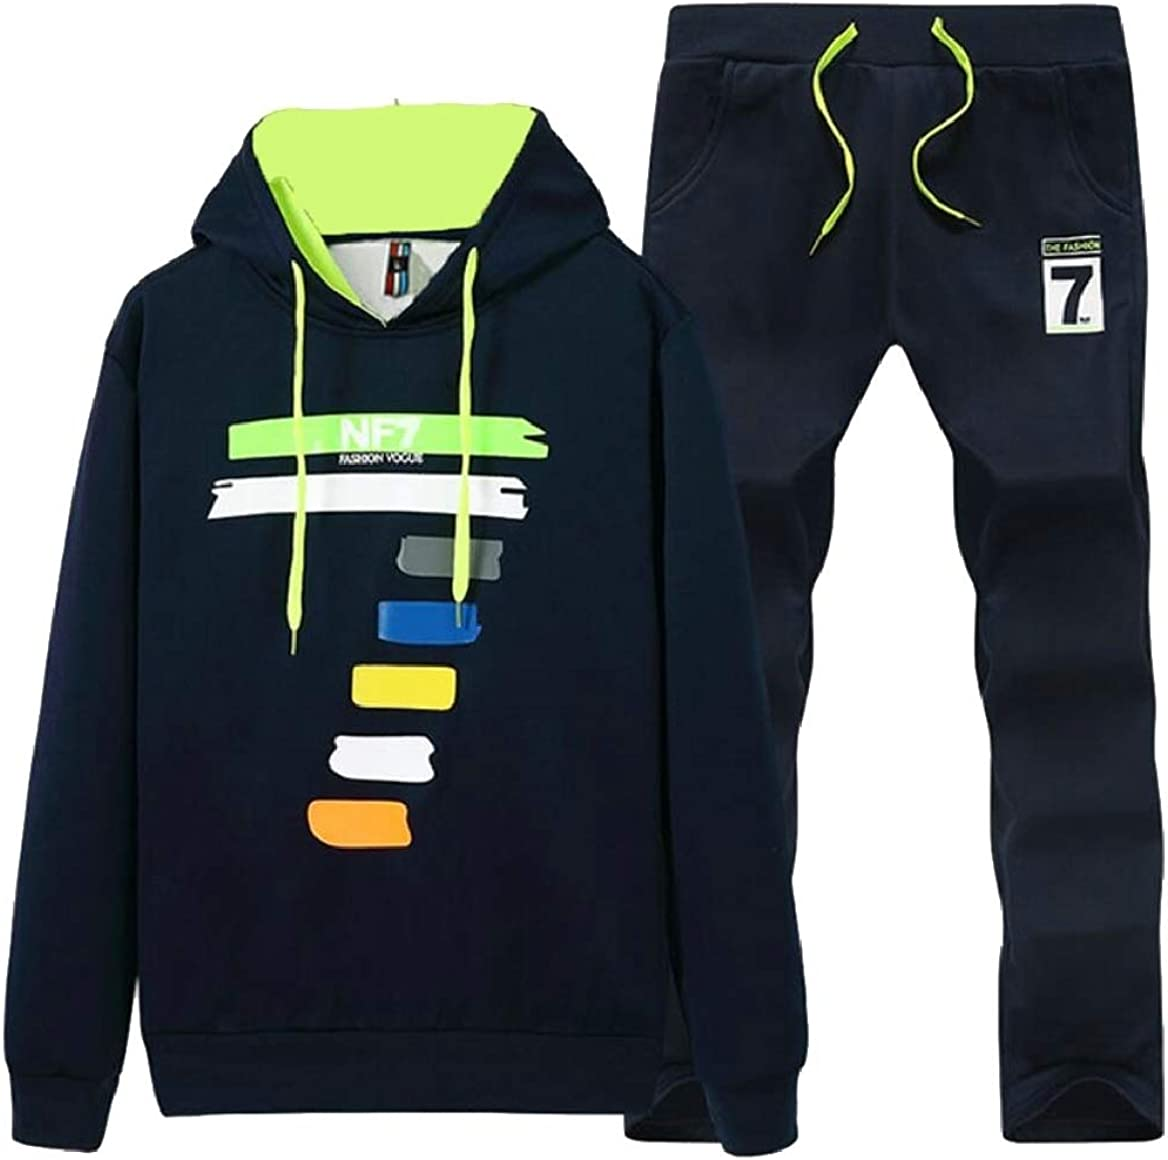 pujingge Mens Pullover Warm Fleece Hoodie Sweatshirt Jogger Suit Tracksuit